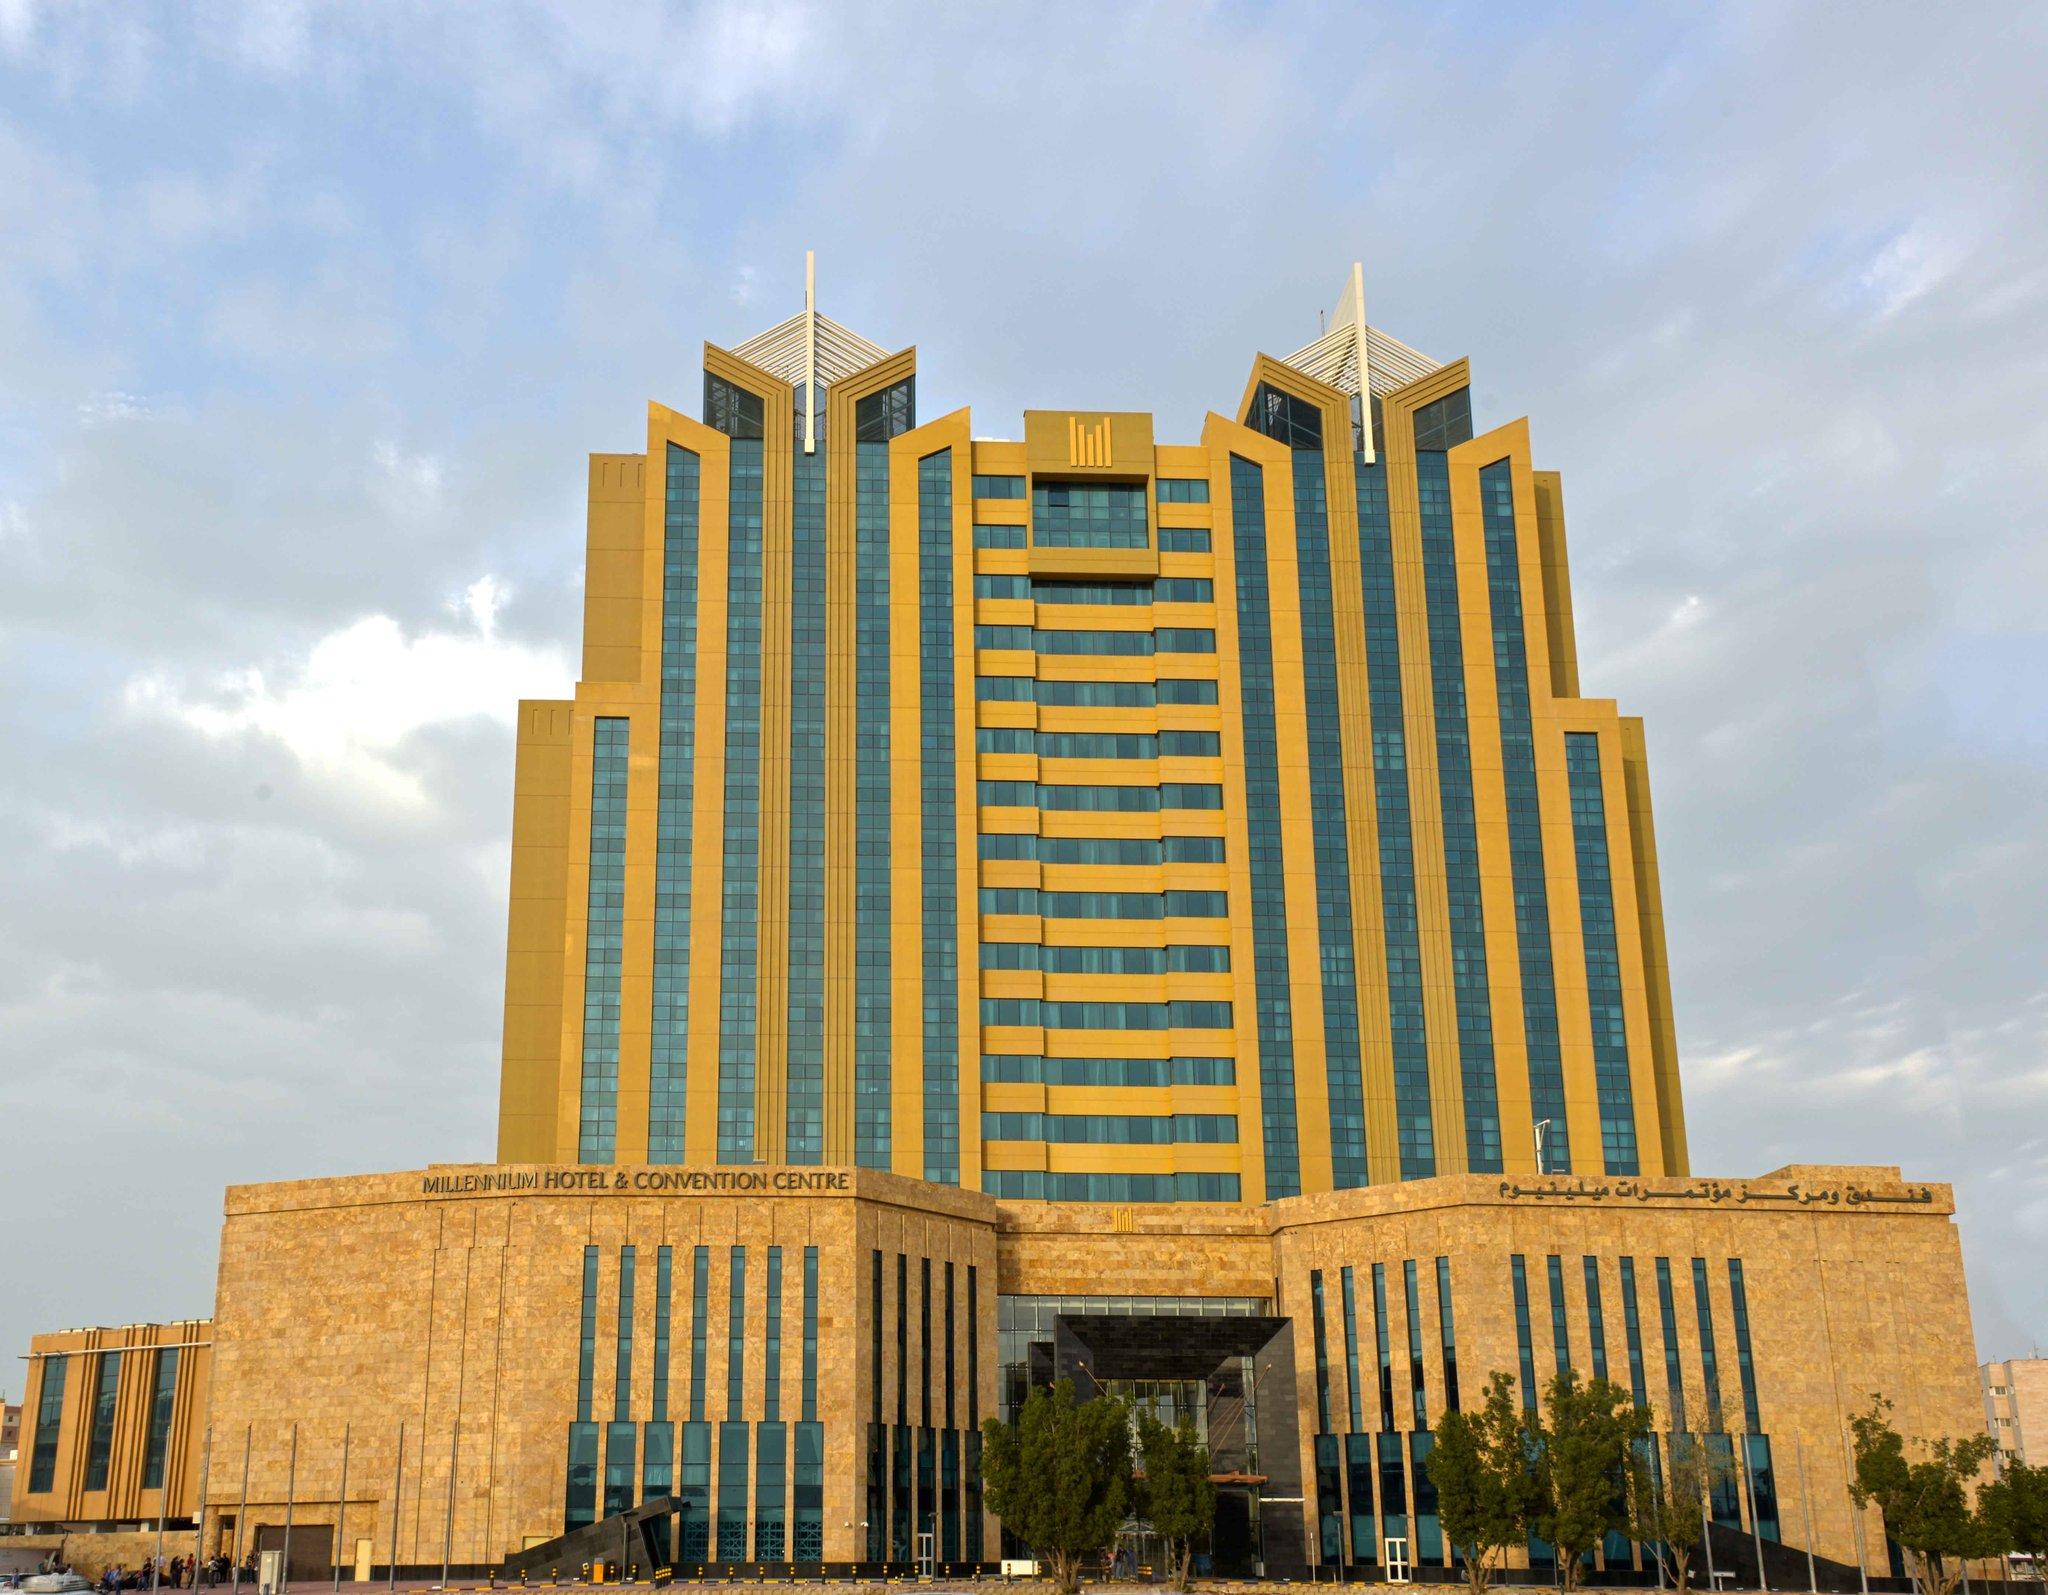 Millennium Hotel & Convention Centre